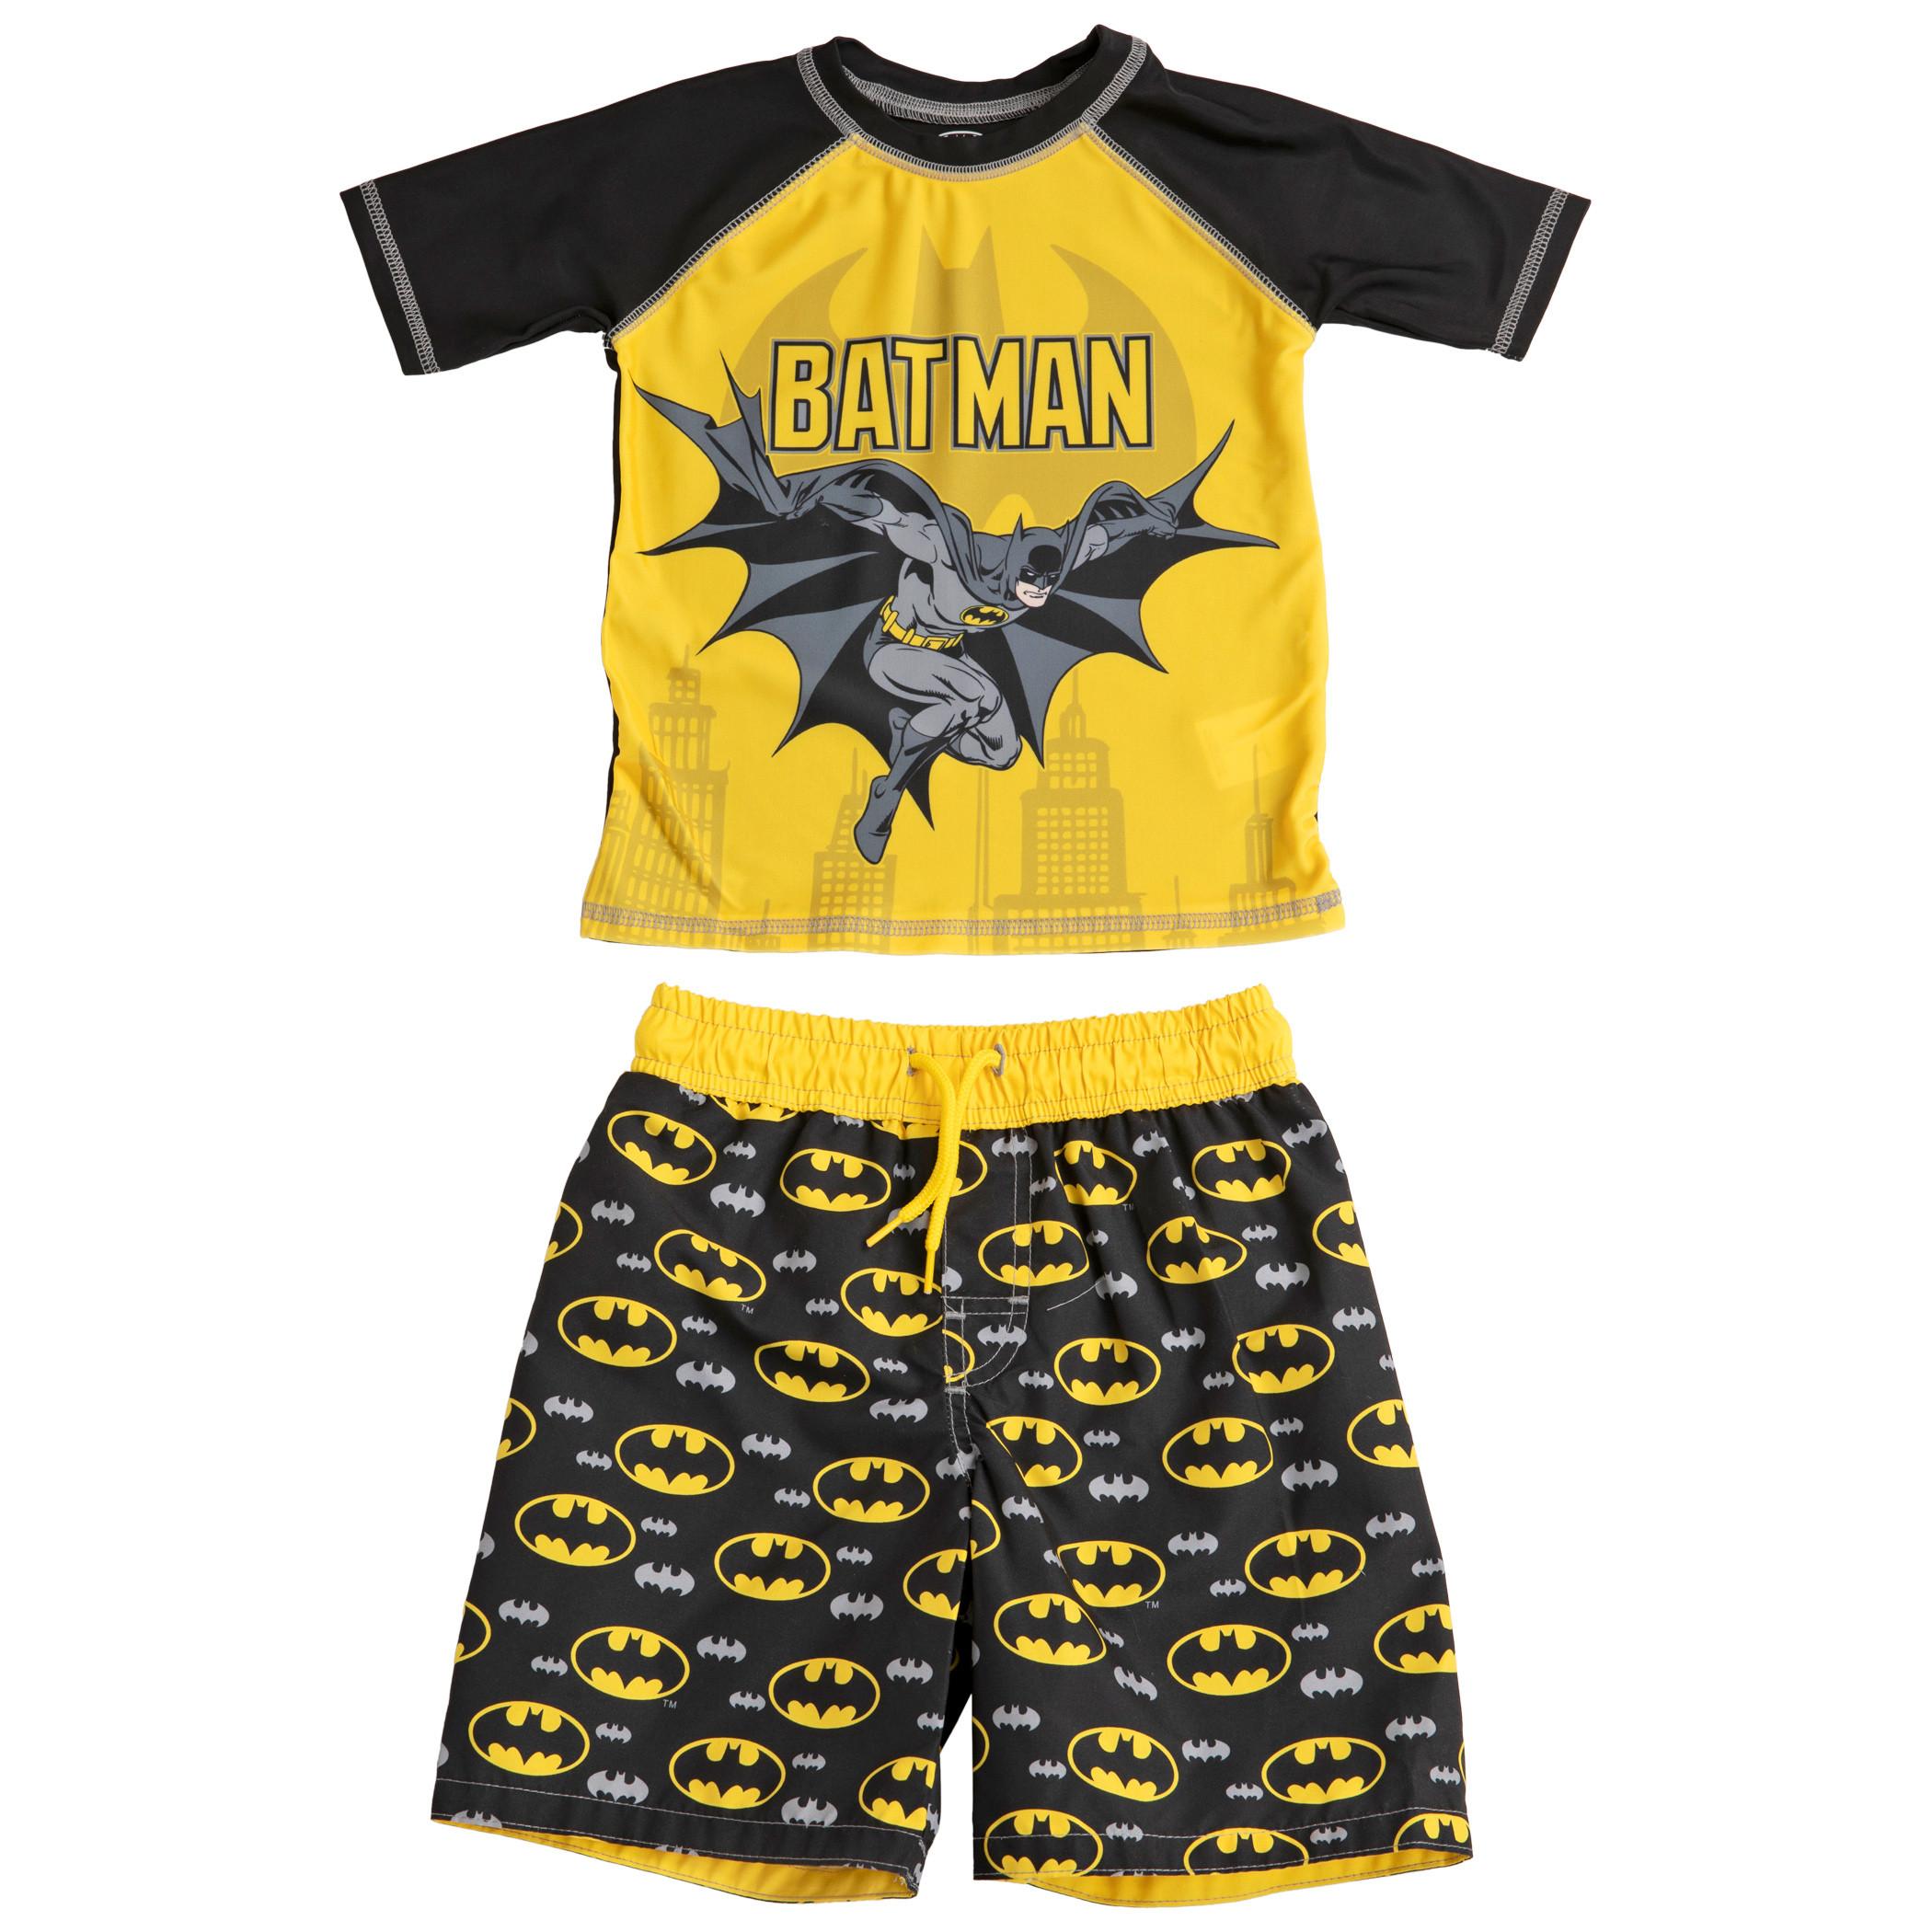 Batman Symbol and Character Youth Swim Trunks and Rashguard Set